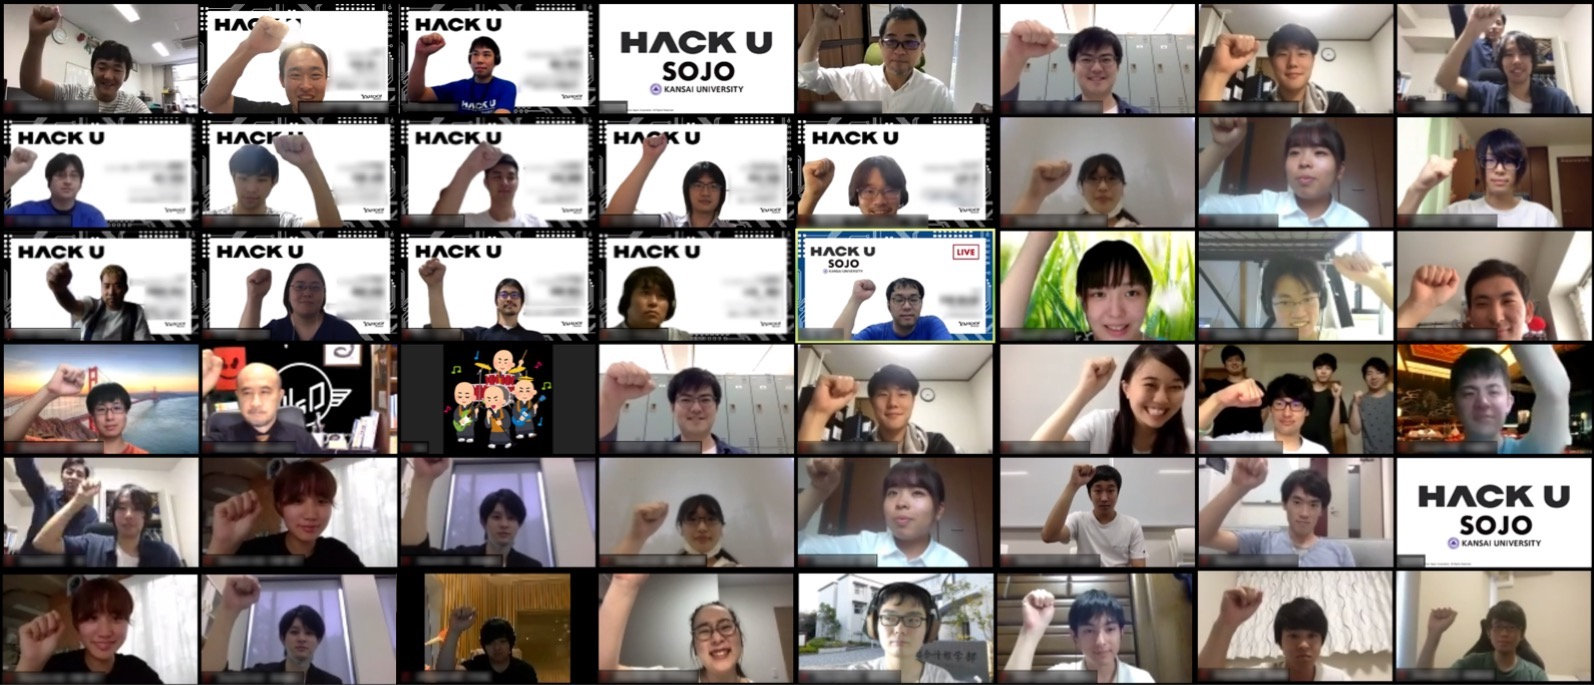 Hack U 関西大学 SOJO 2019のキービジュアル画像